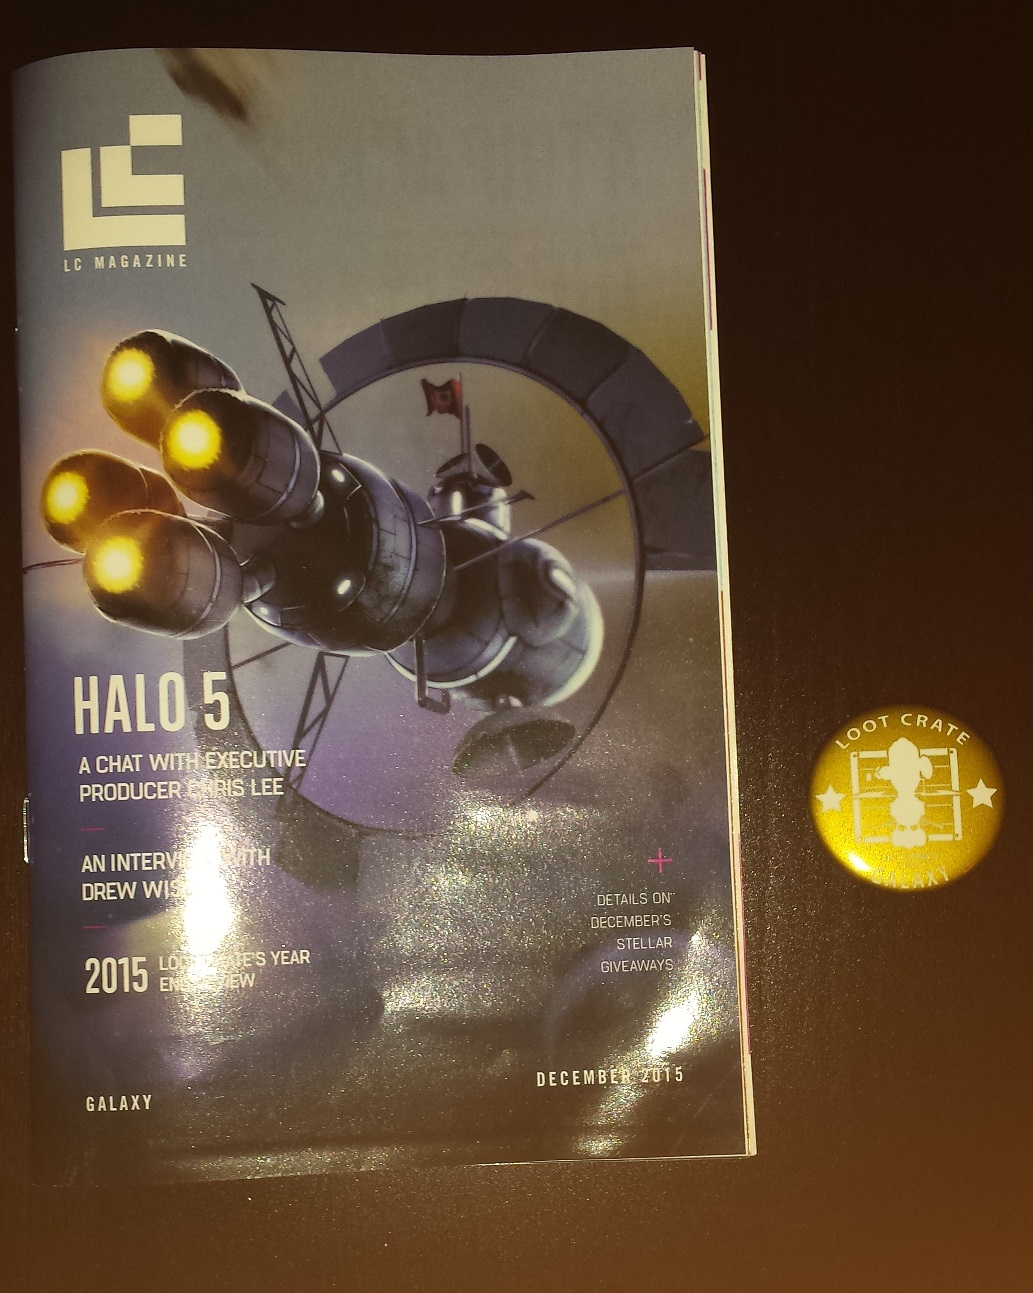 Loot crate magazine, halo 5